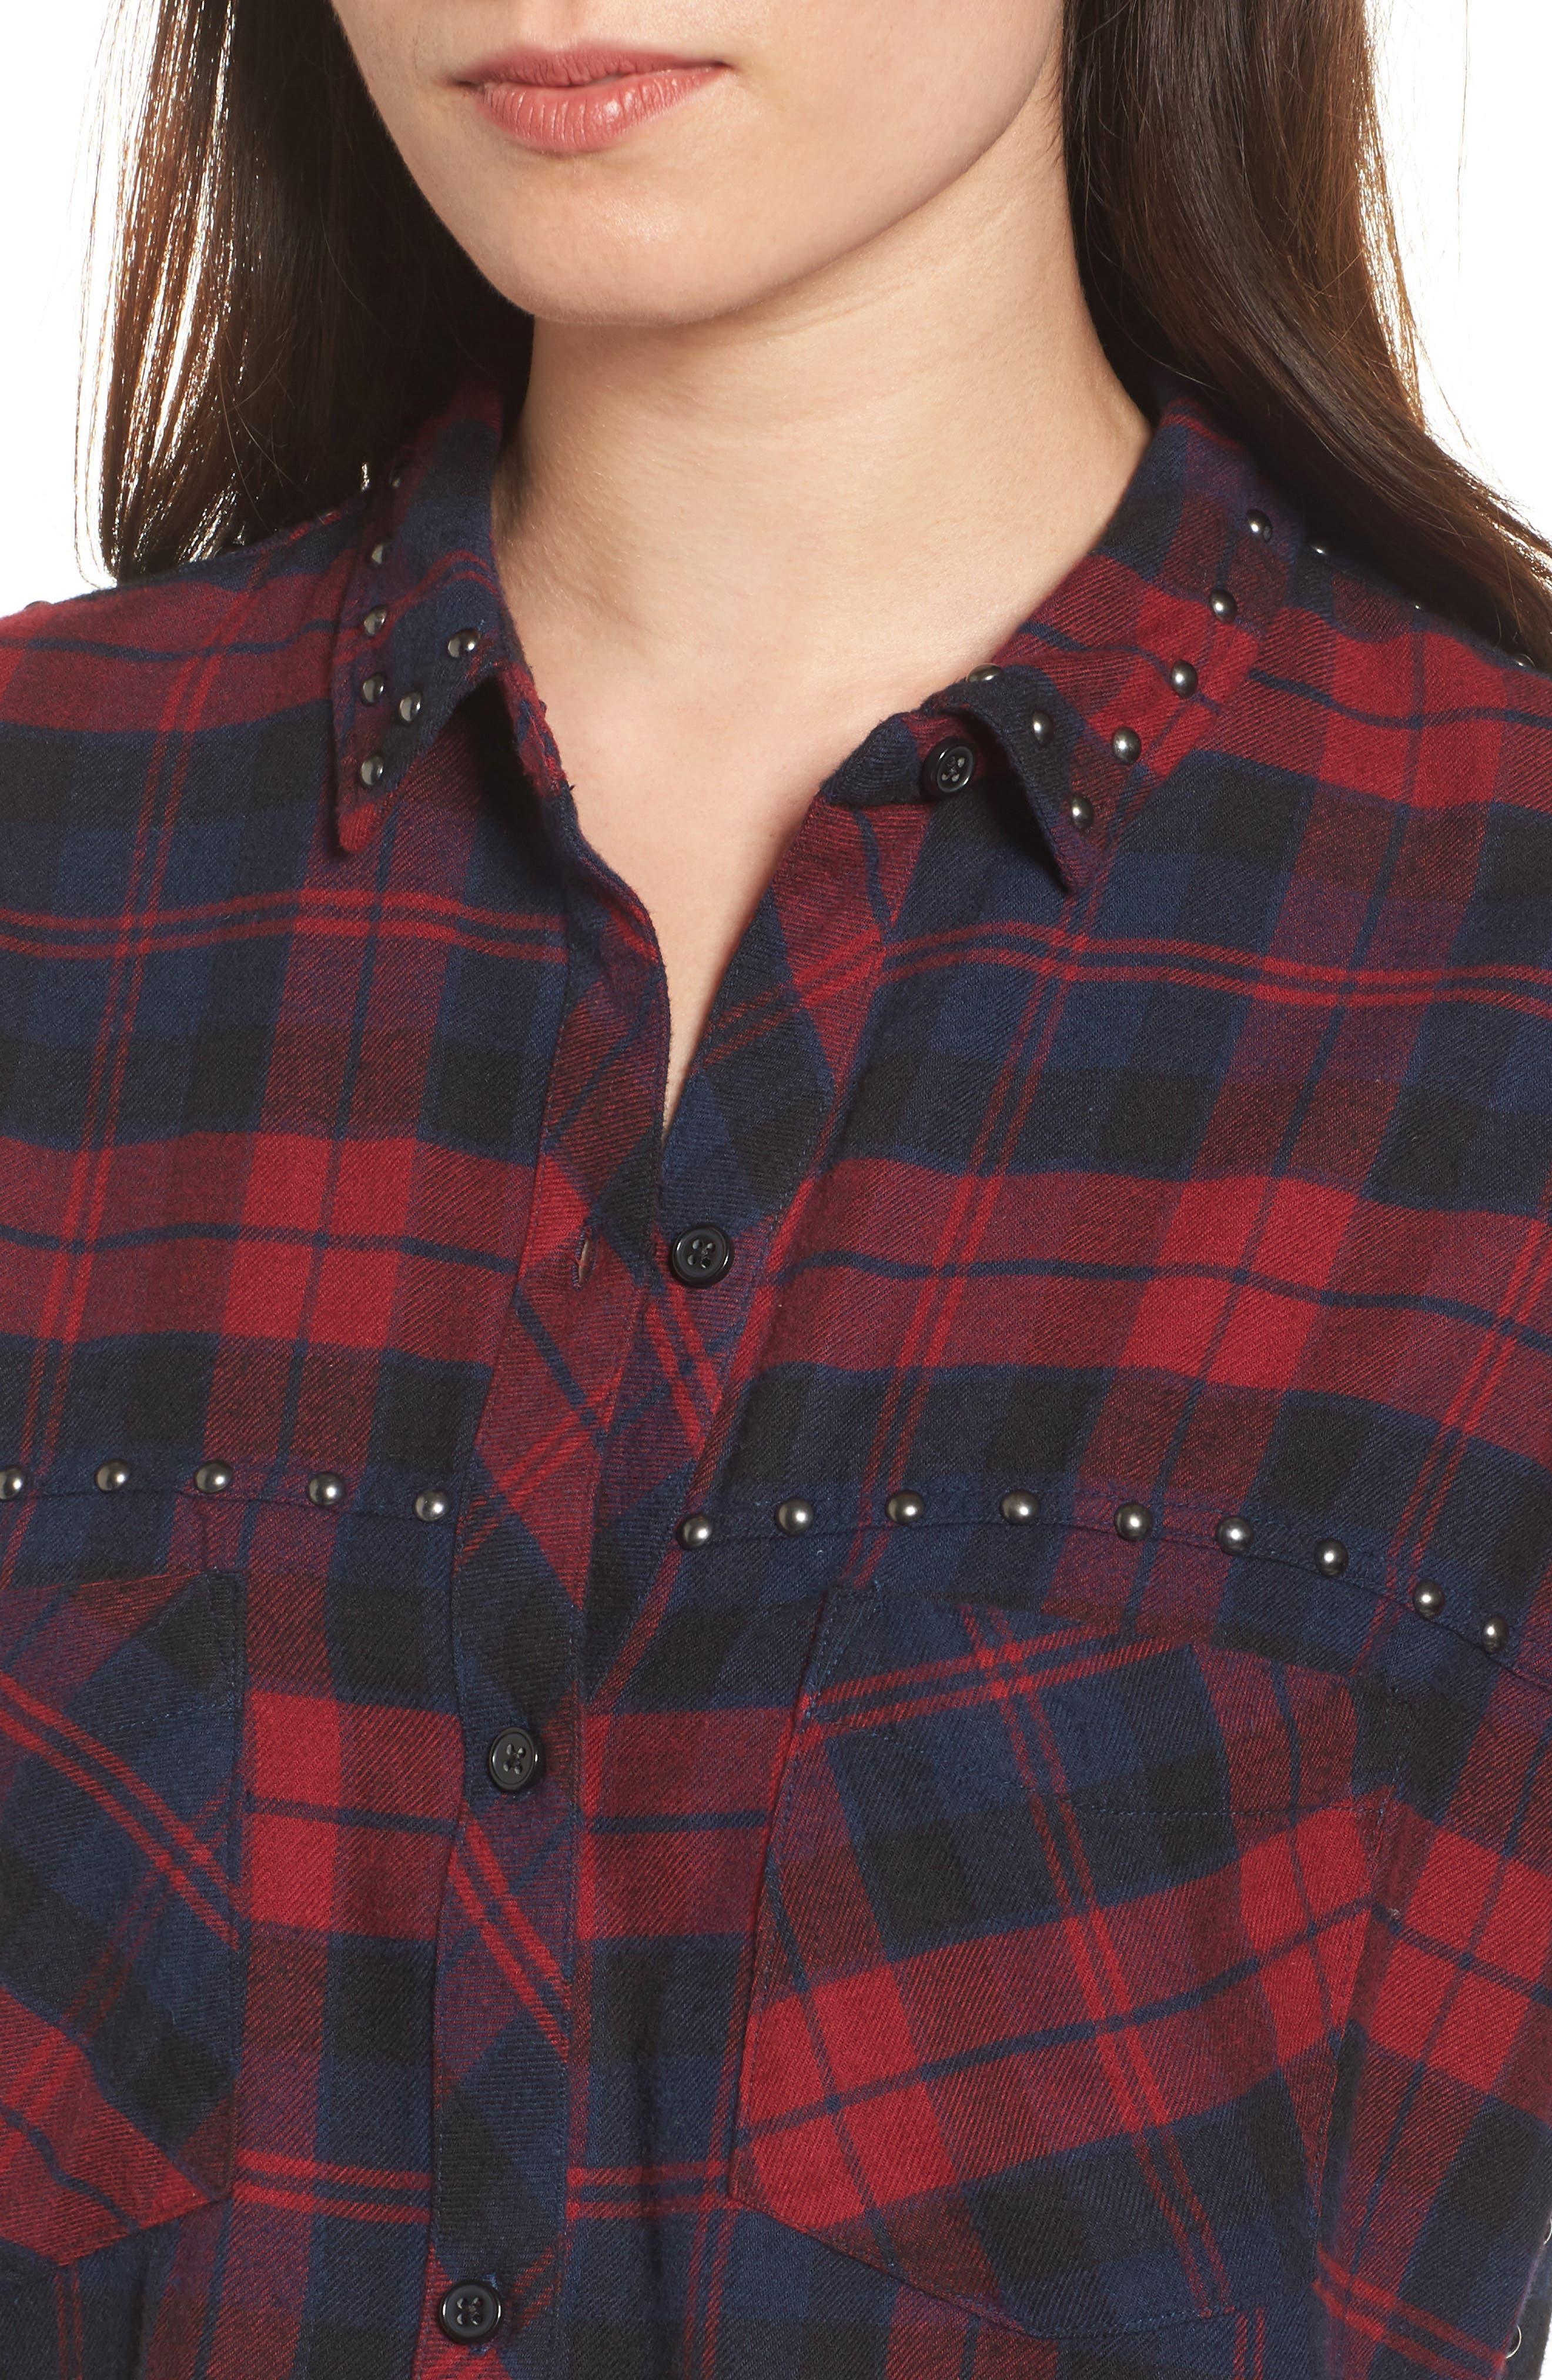 Rex Studded Plaid Shirt,                             Alternate thumbnail 4, color,                             622